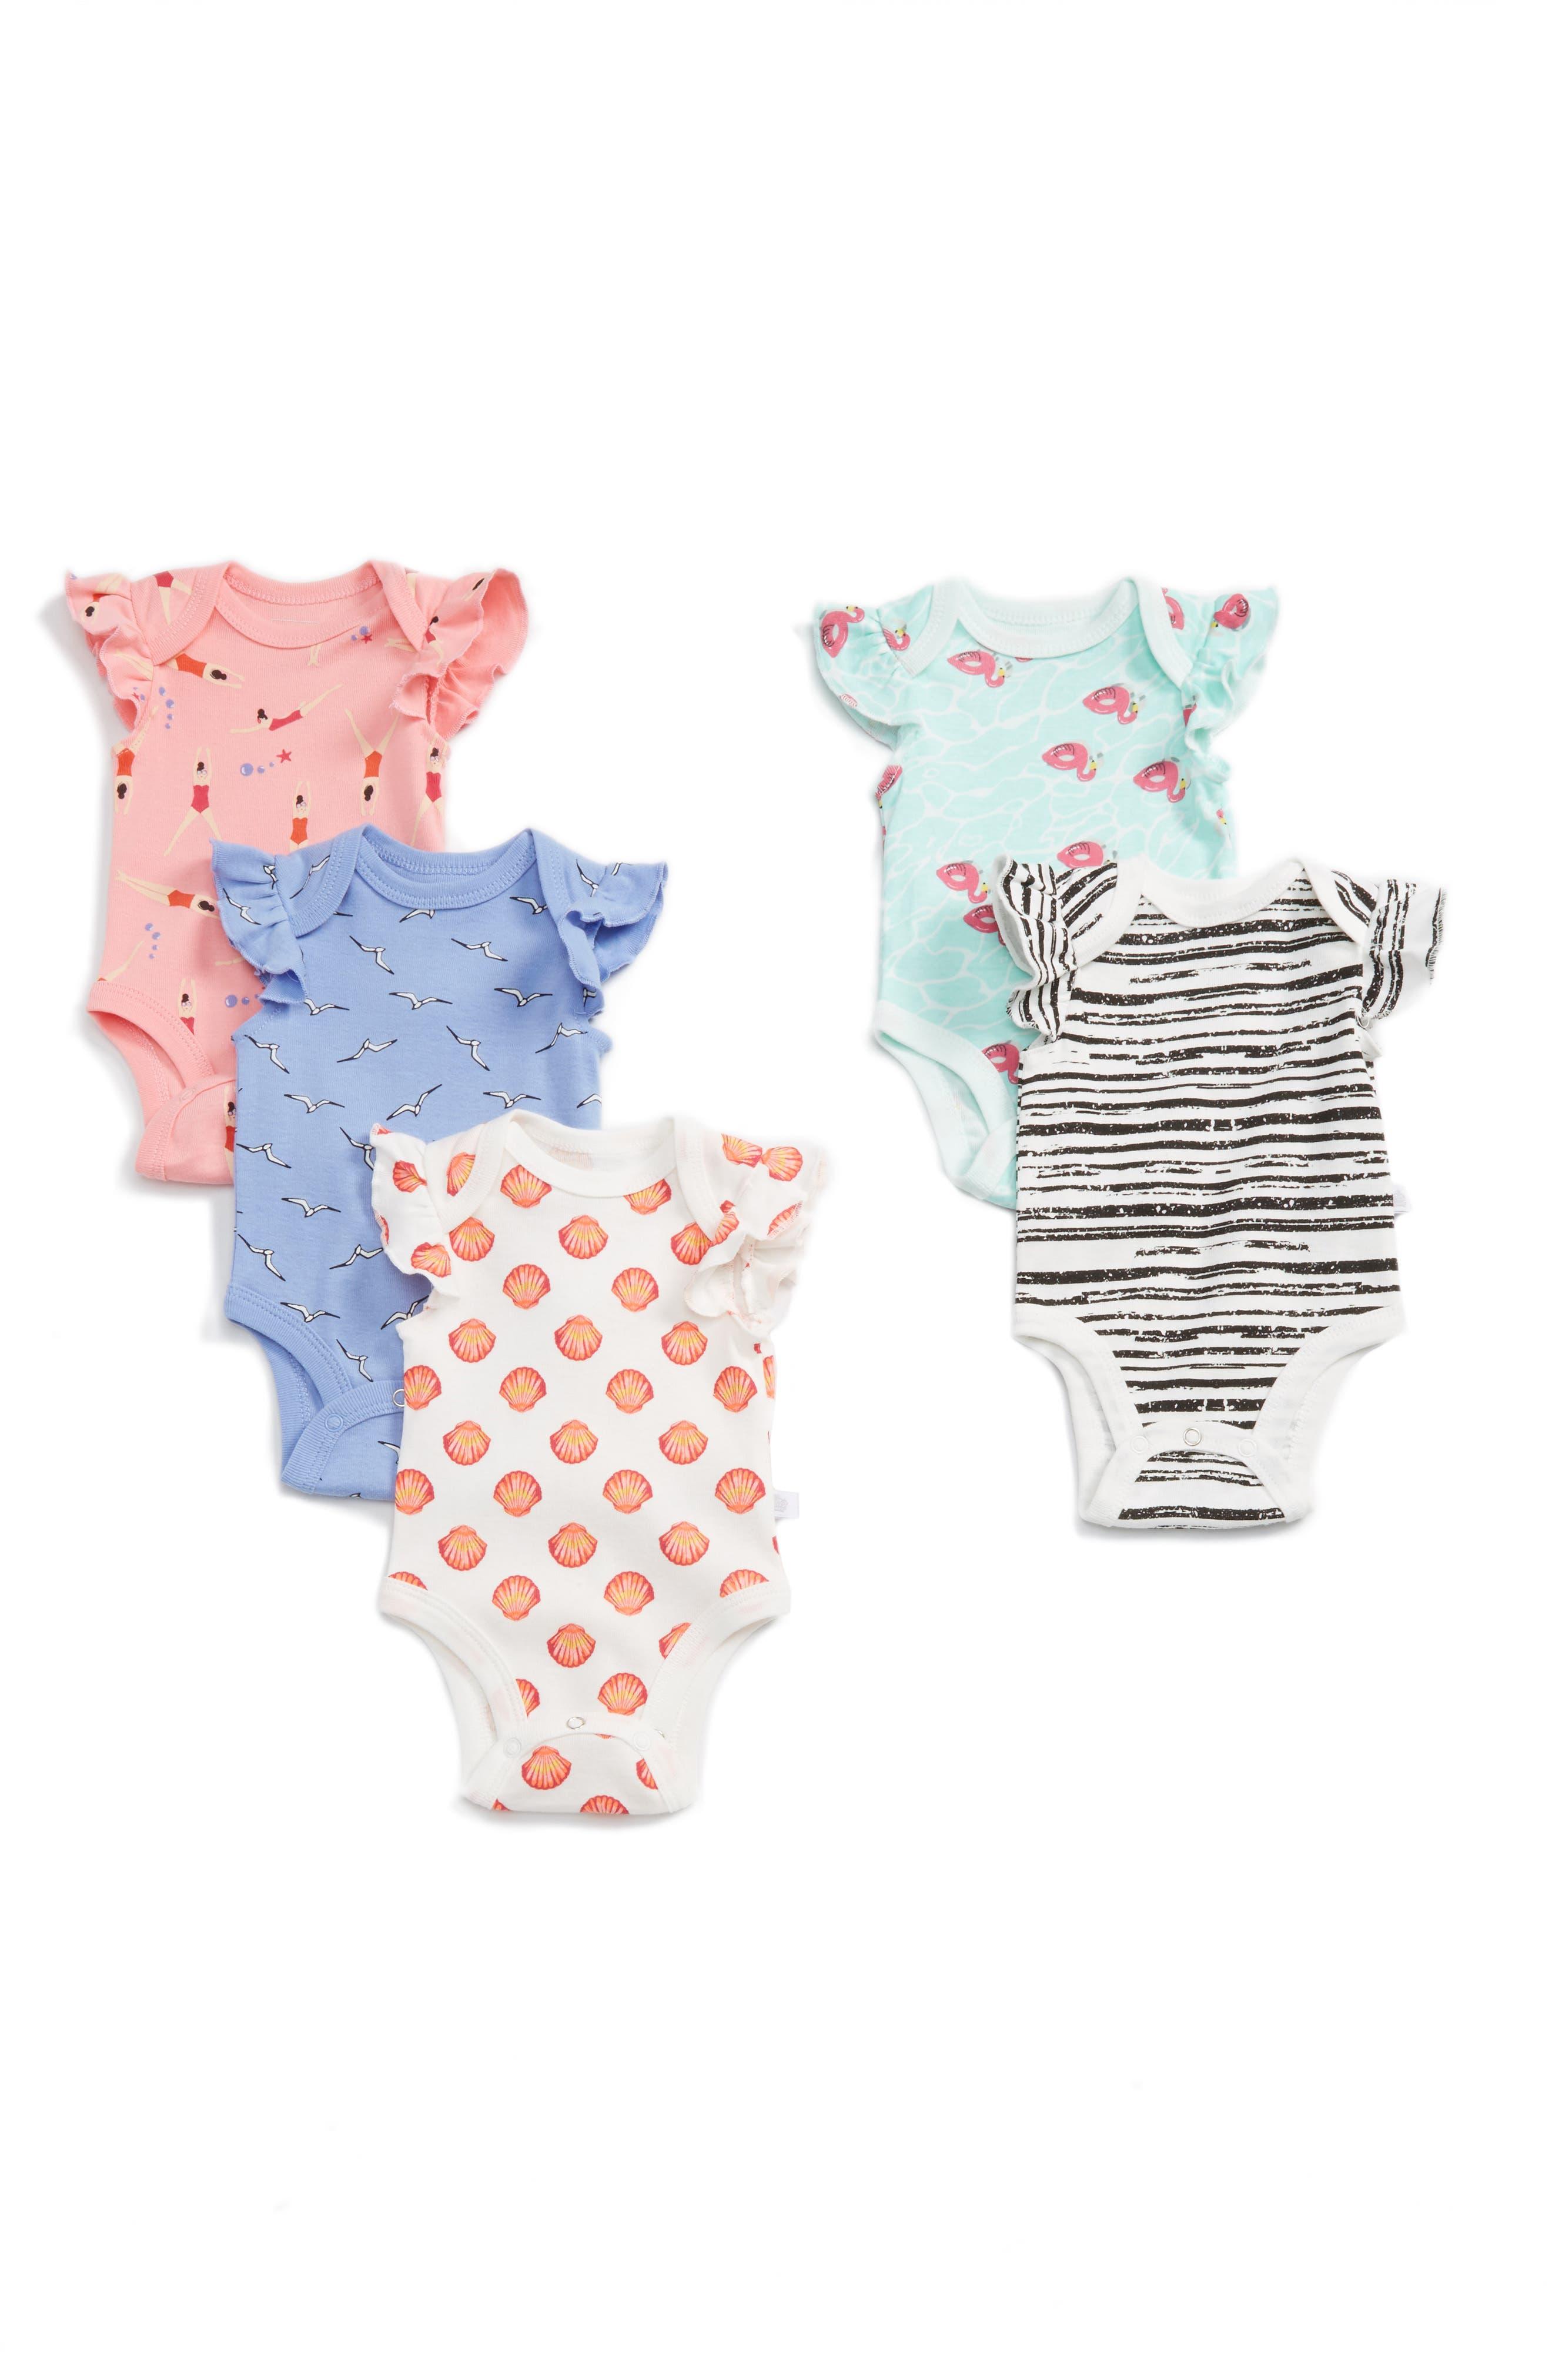 Rosie Pope 5-Pack Bodysuits (Baby Girls)